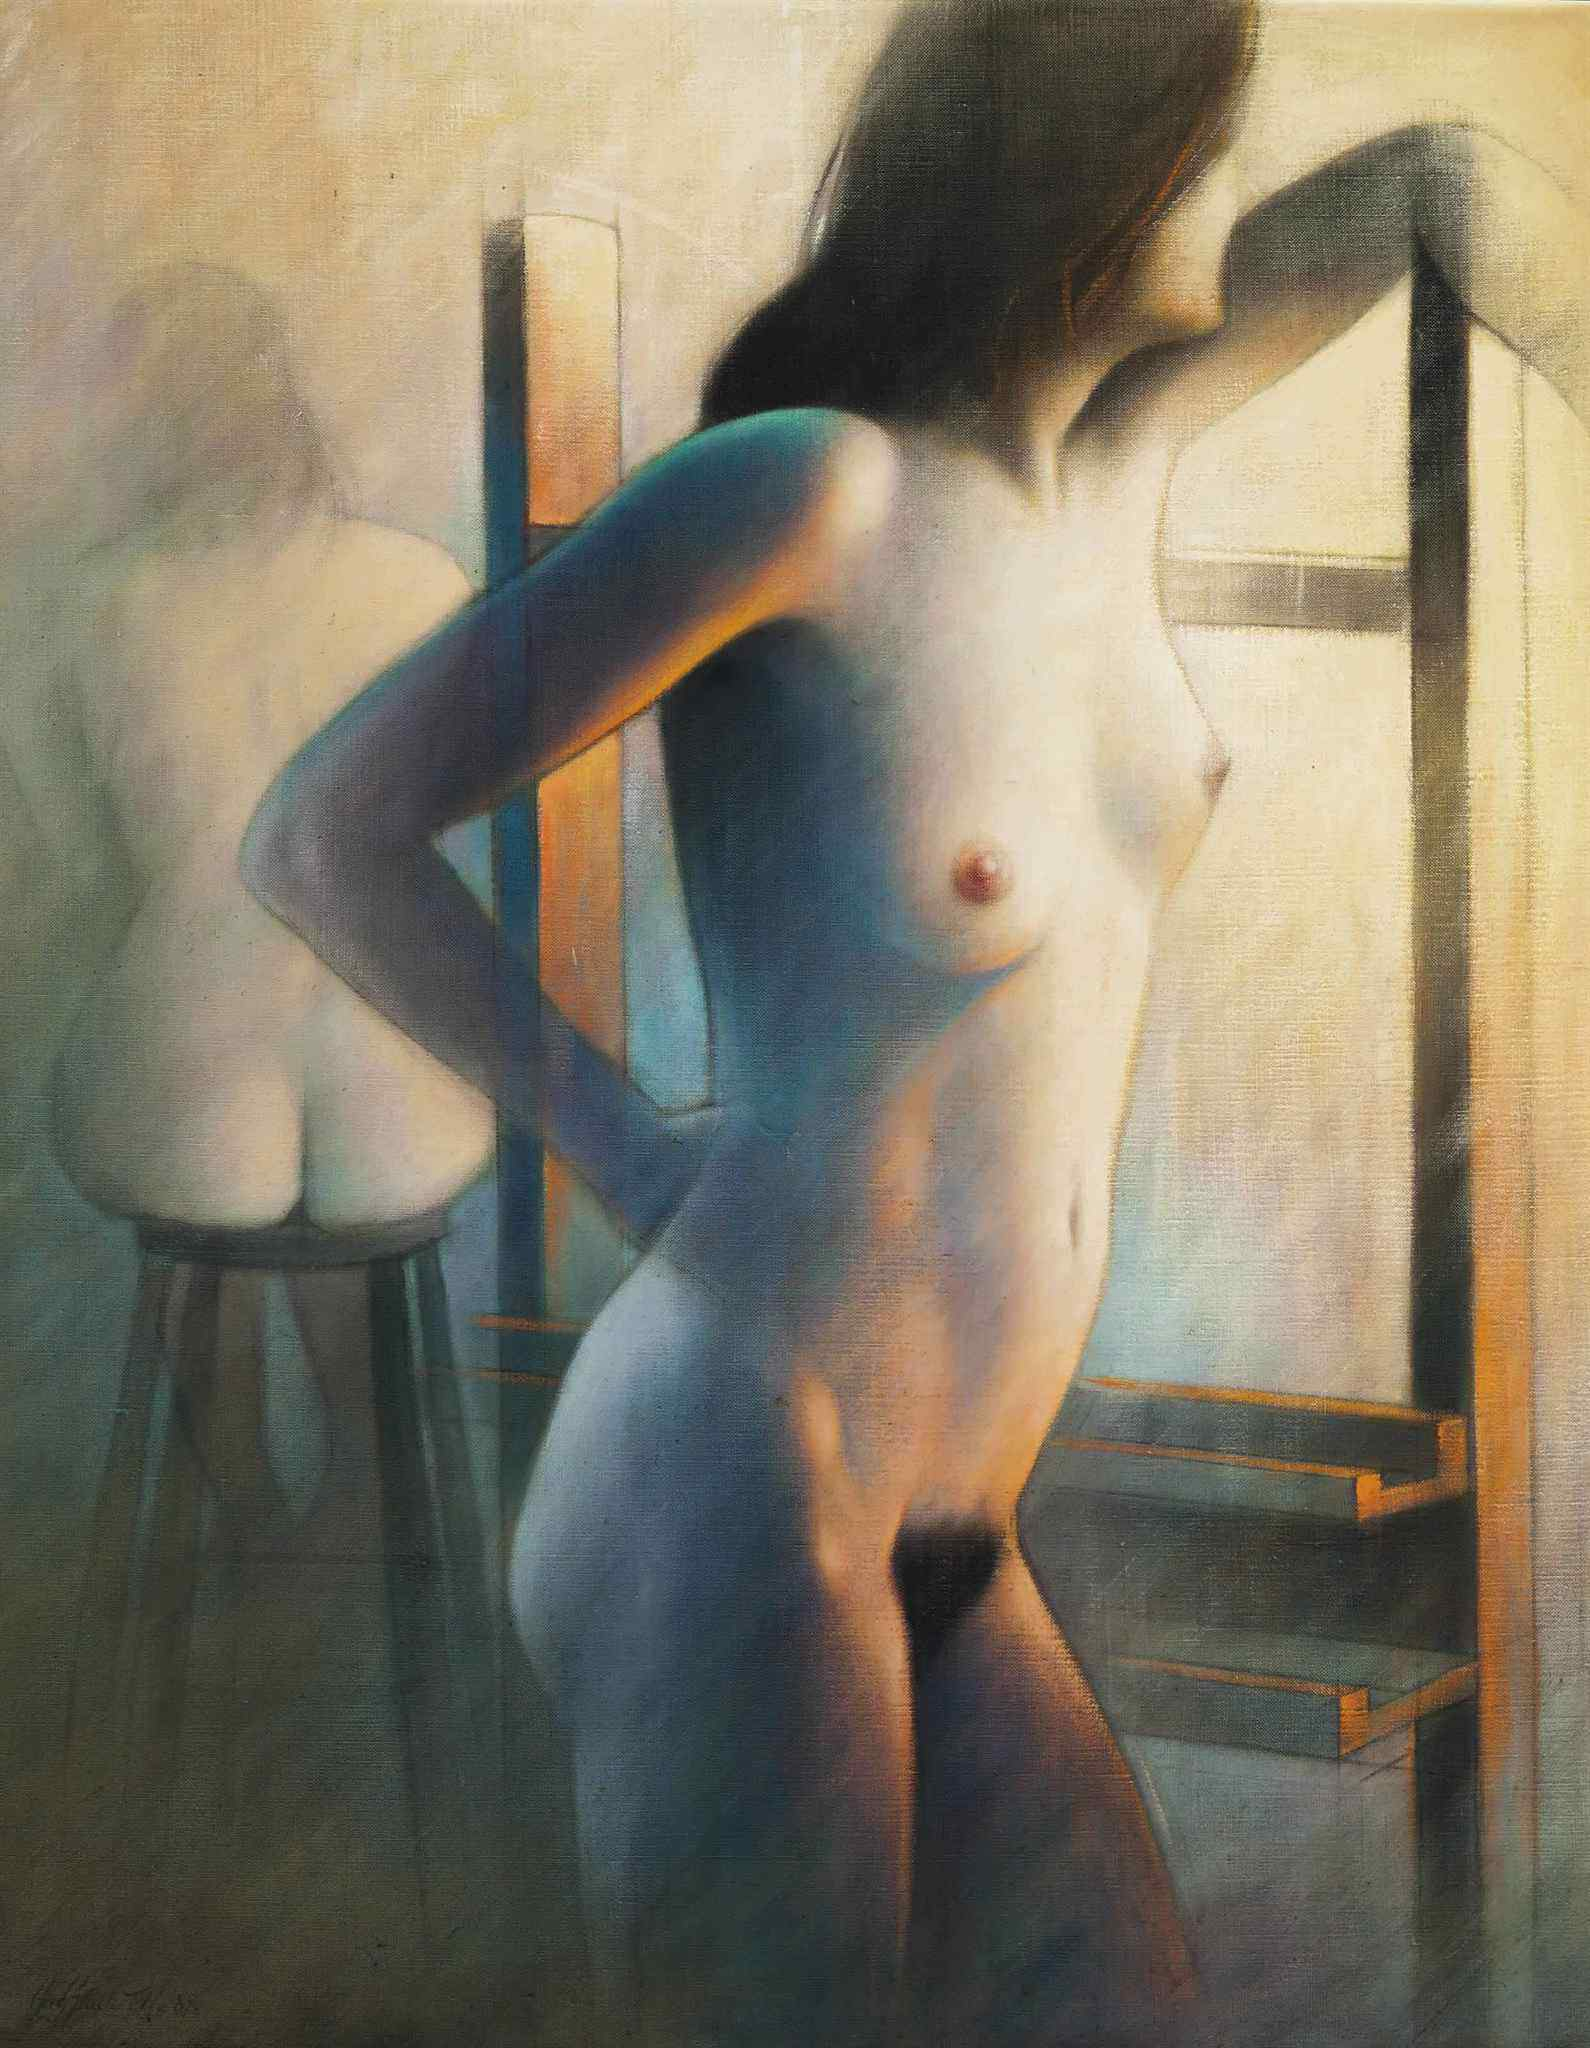 Guy Gladwell, род в 1946. Обнаженная в двух ракурсах. 91 x 71.1 см. Частная коллекция